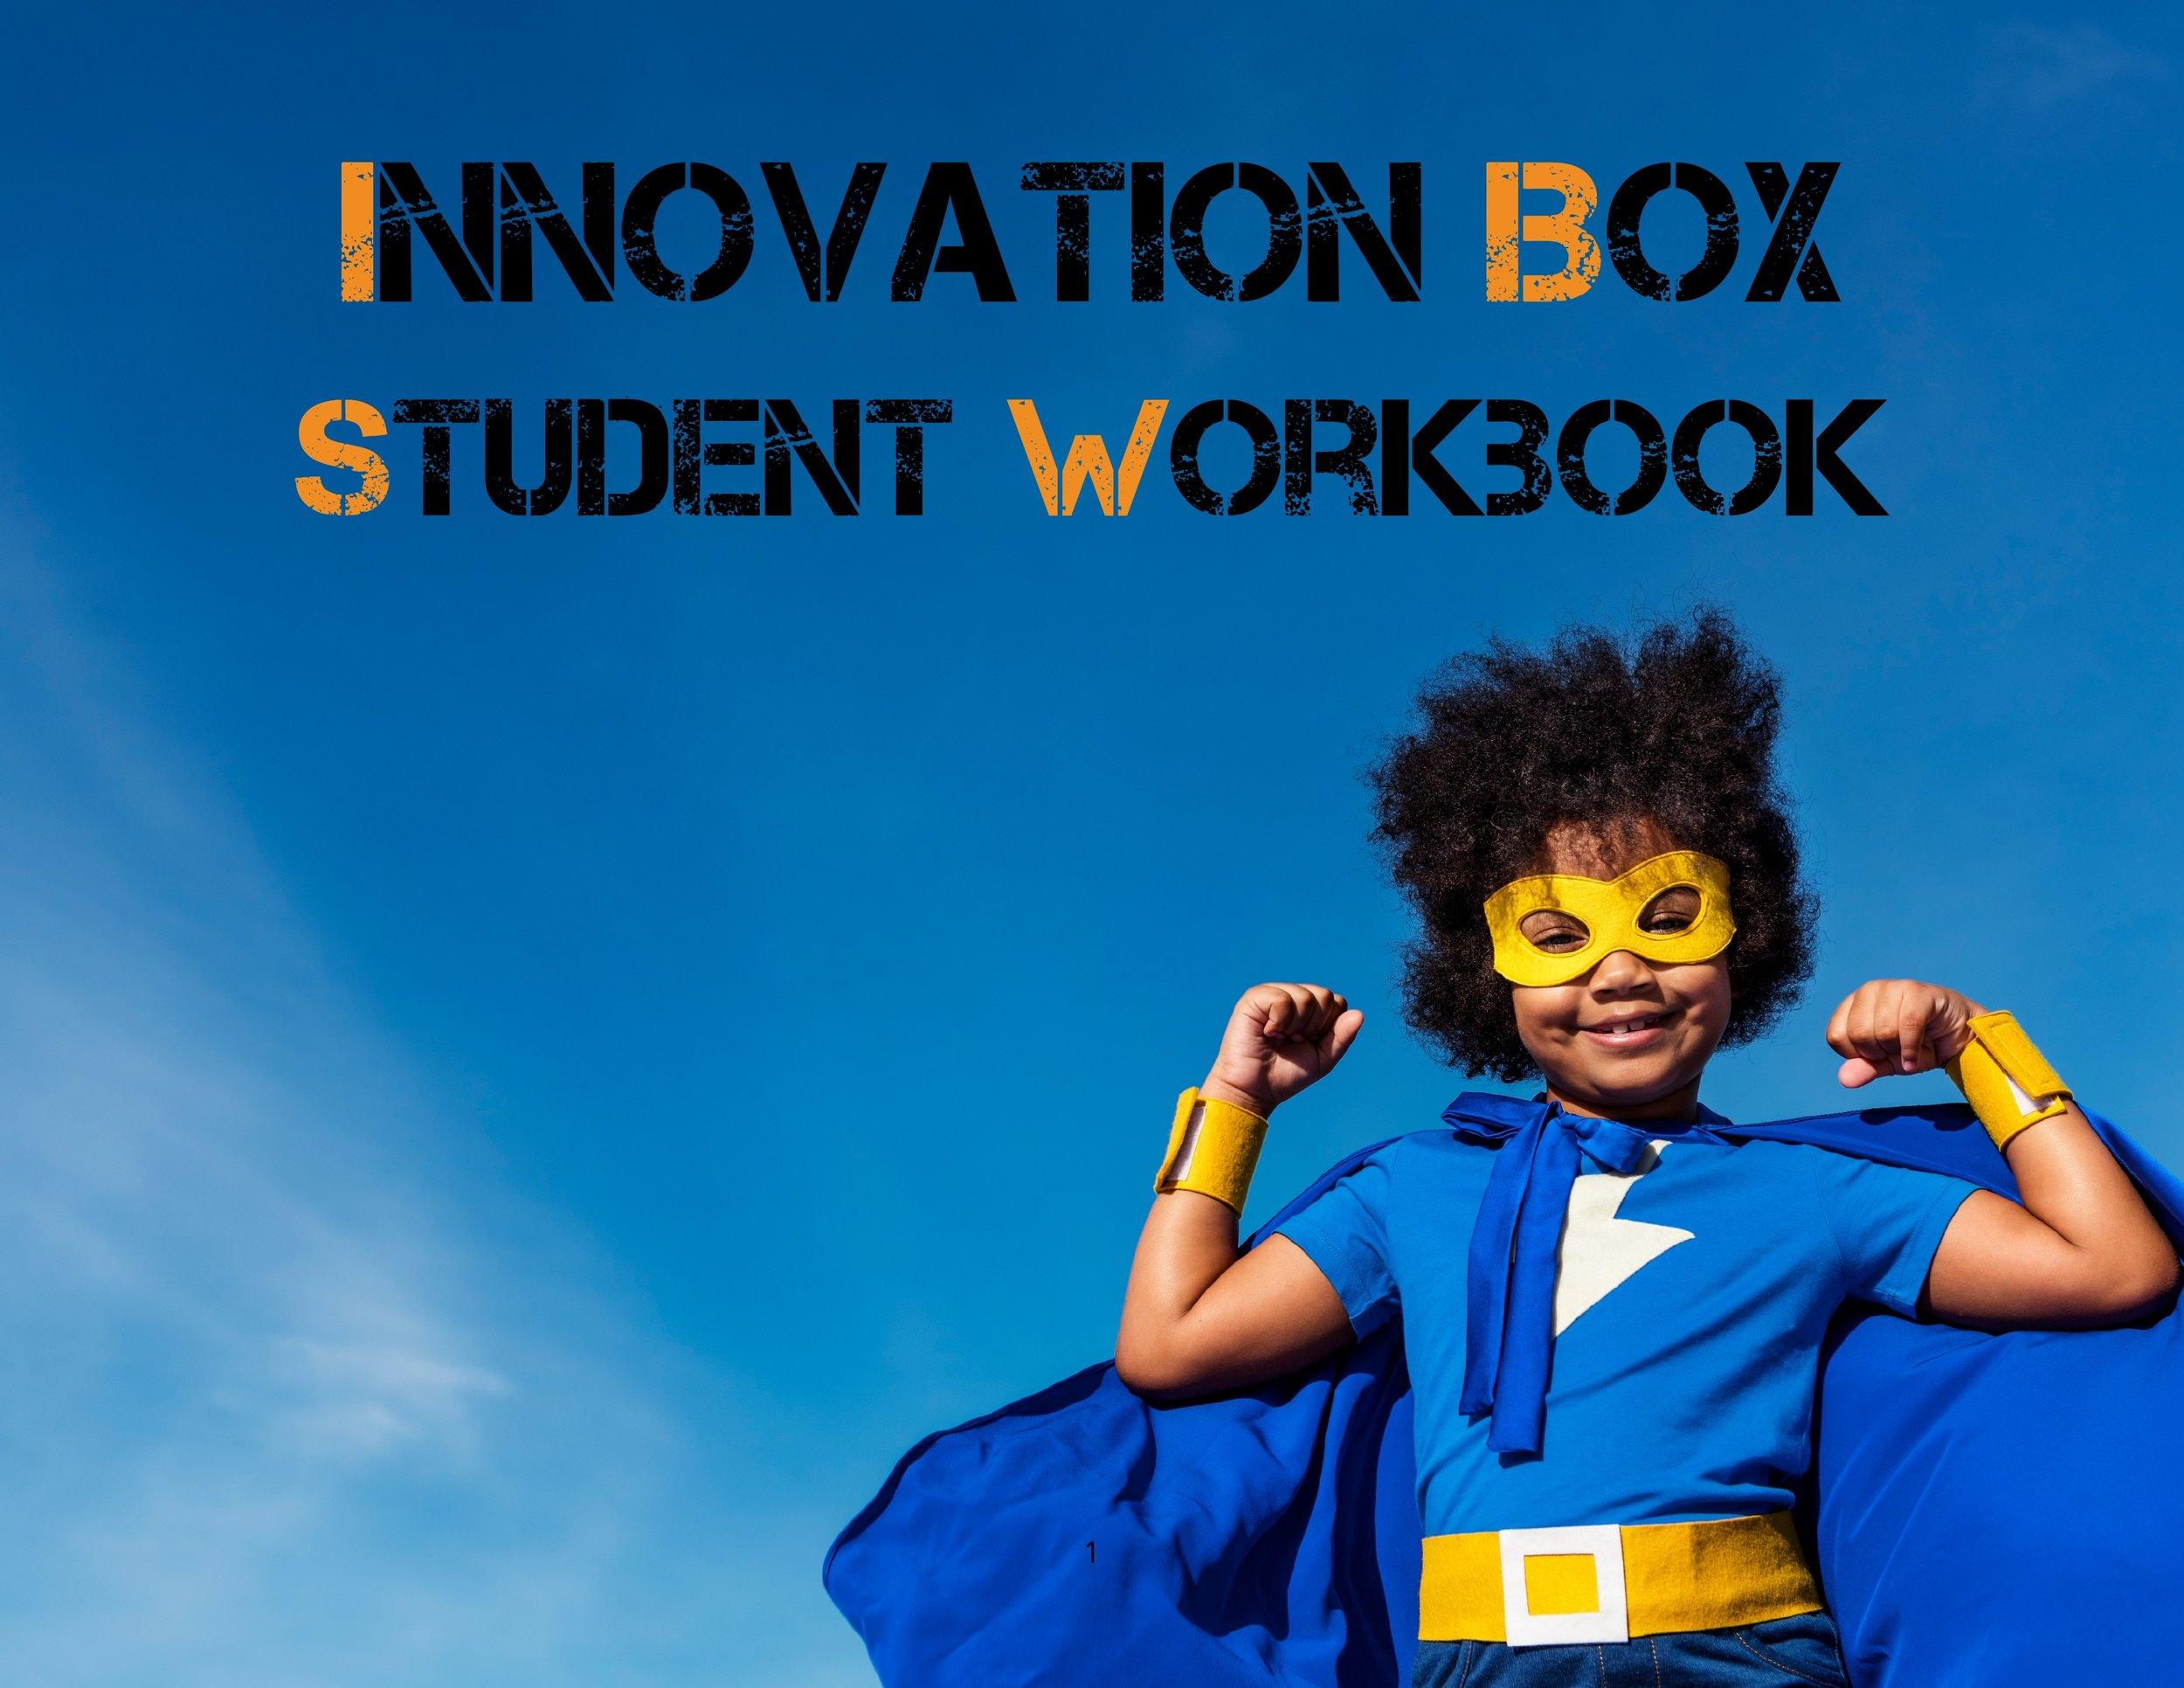 Student Workbook - Version 2.0 - Untitled Page.jpeg